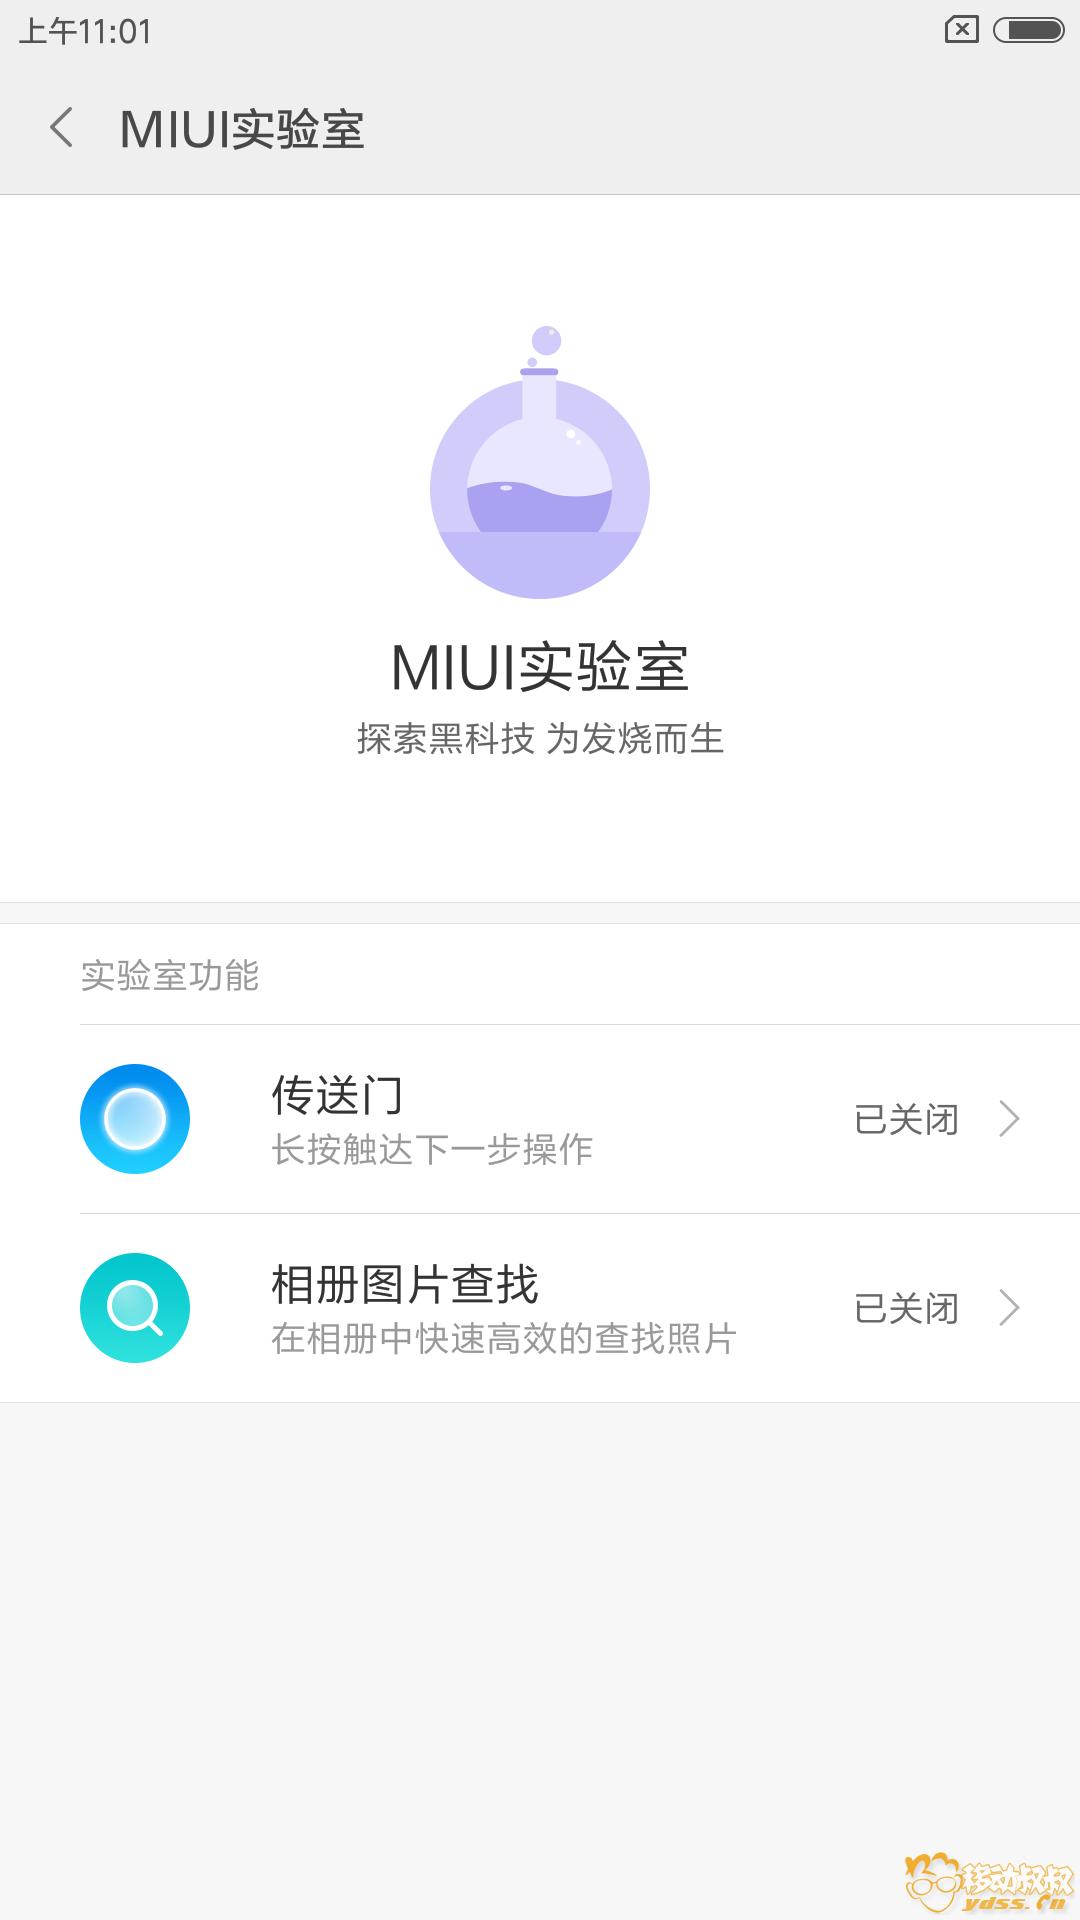 Screenshot_2018-06-06-11-01-11-424_com.android.settings.png